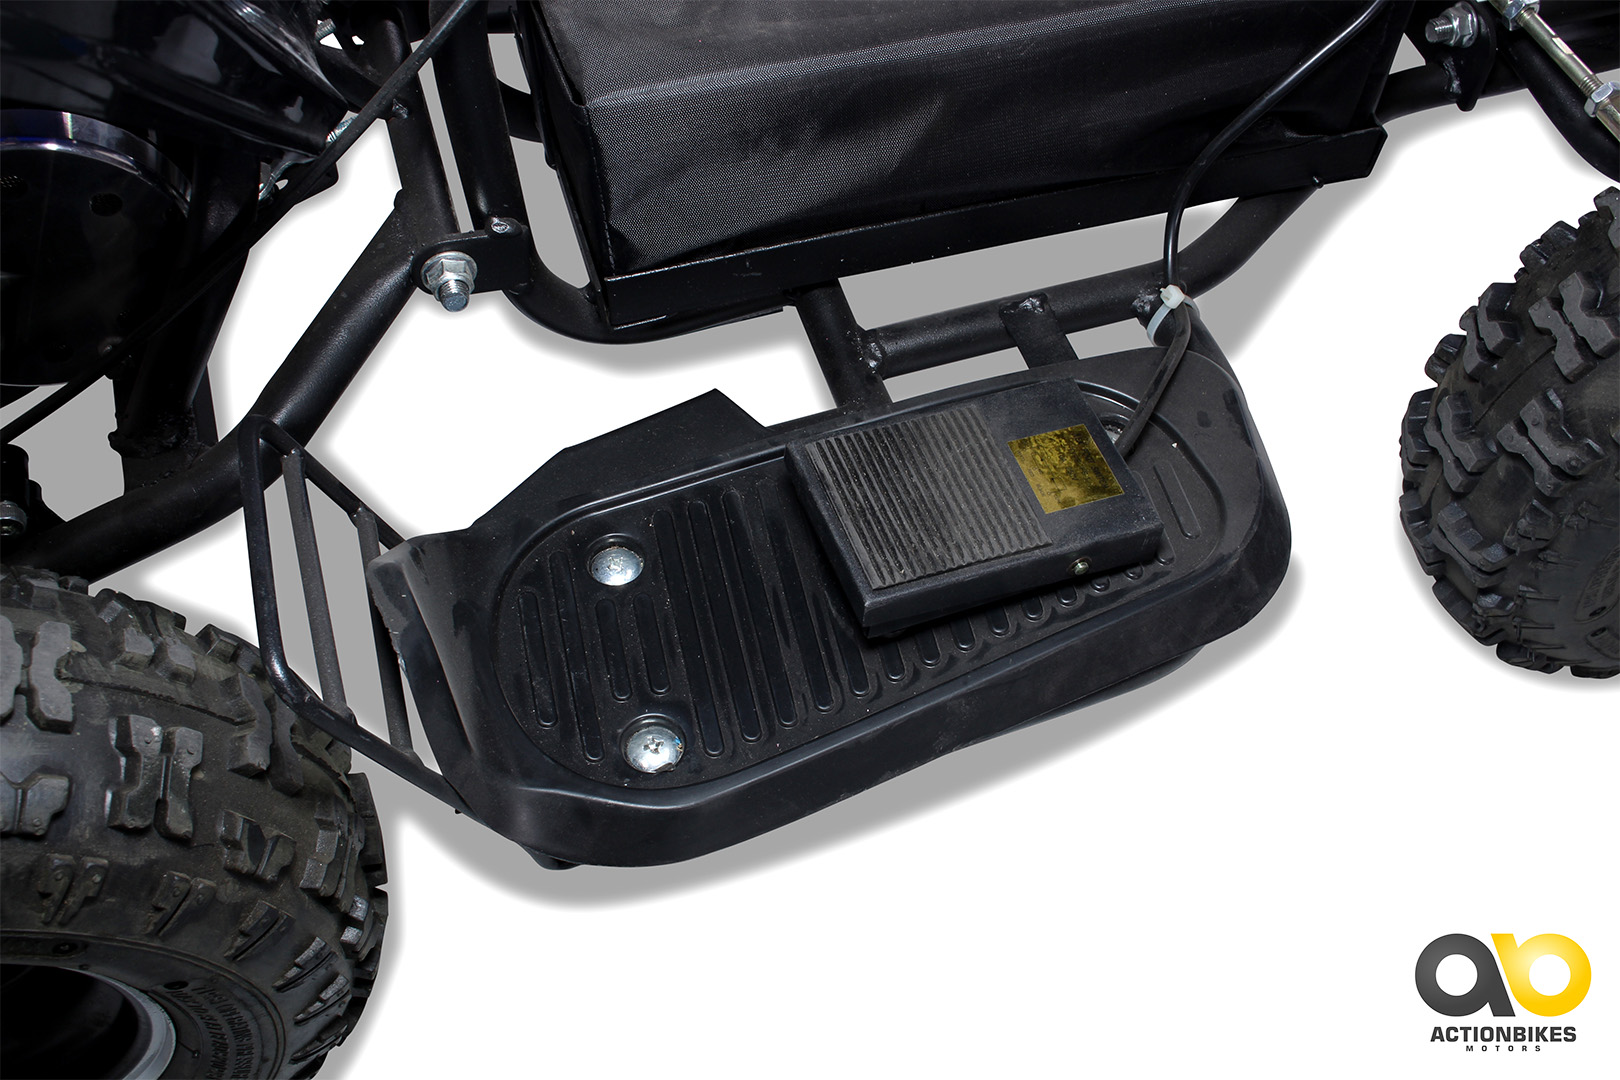 Mini Elektro Kinder Racer 800 Watt Atv Pocket Quad Kinder Quads